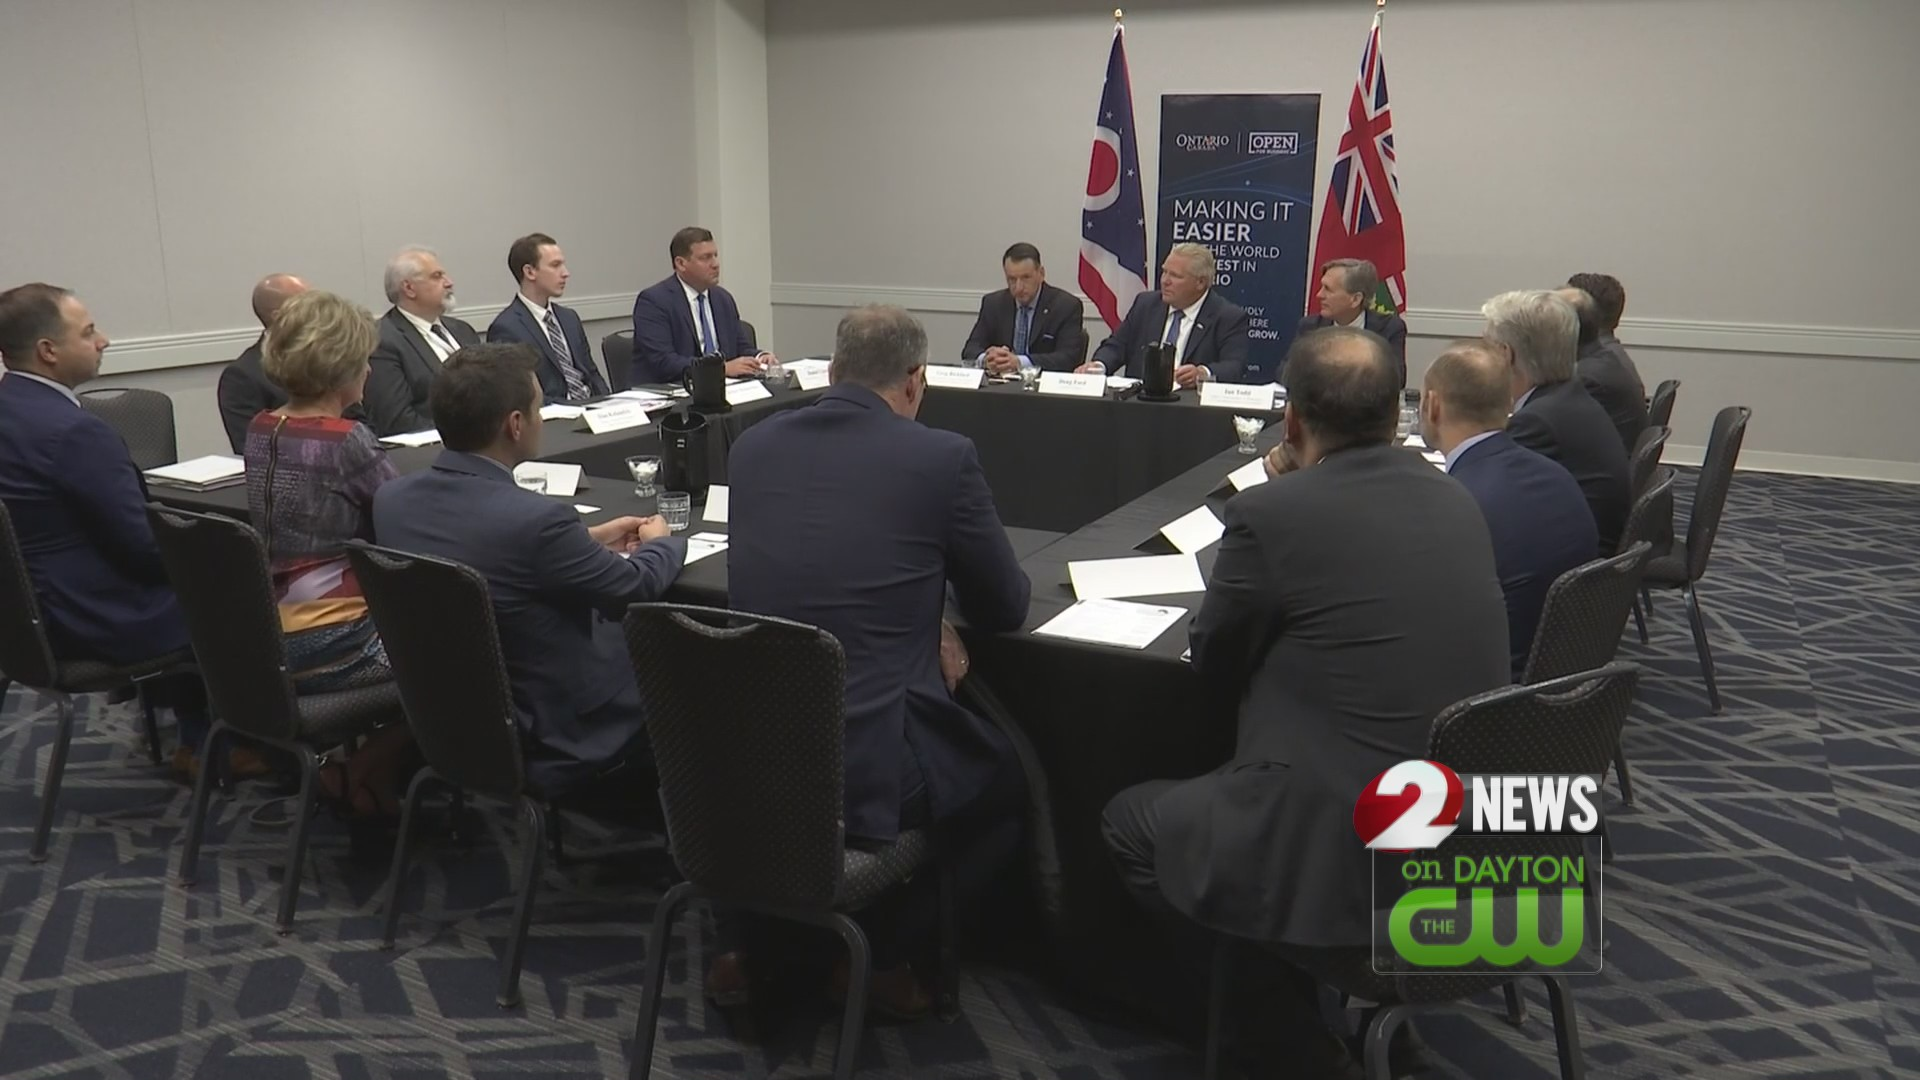 Premier of Ontario visits Ohio